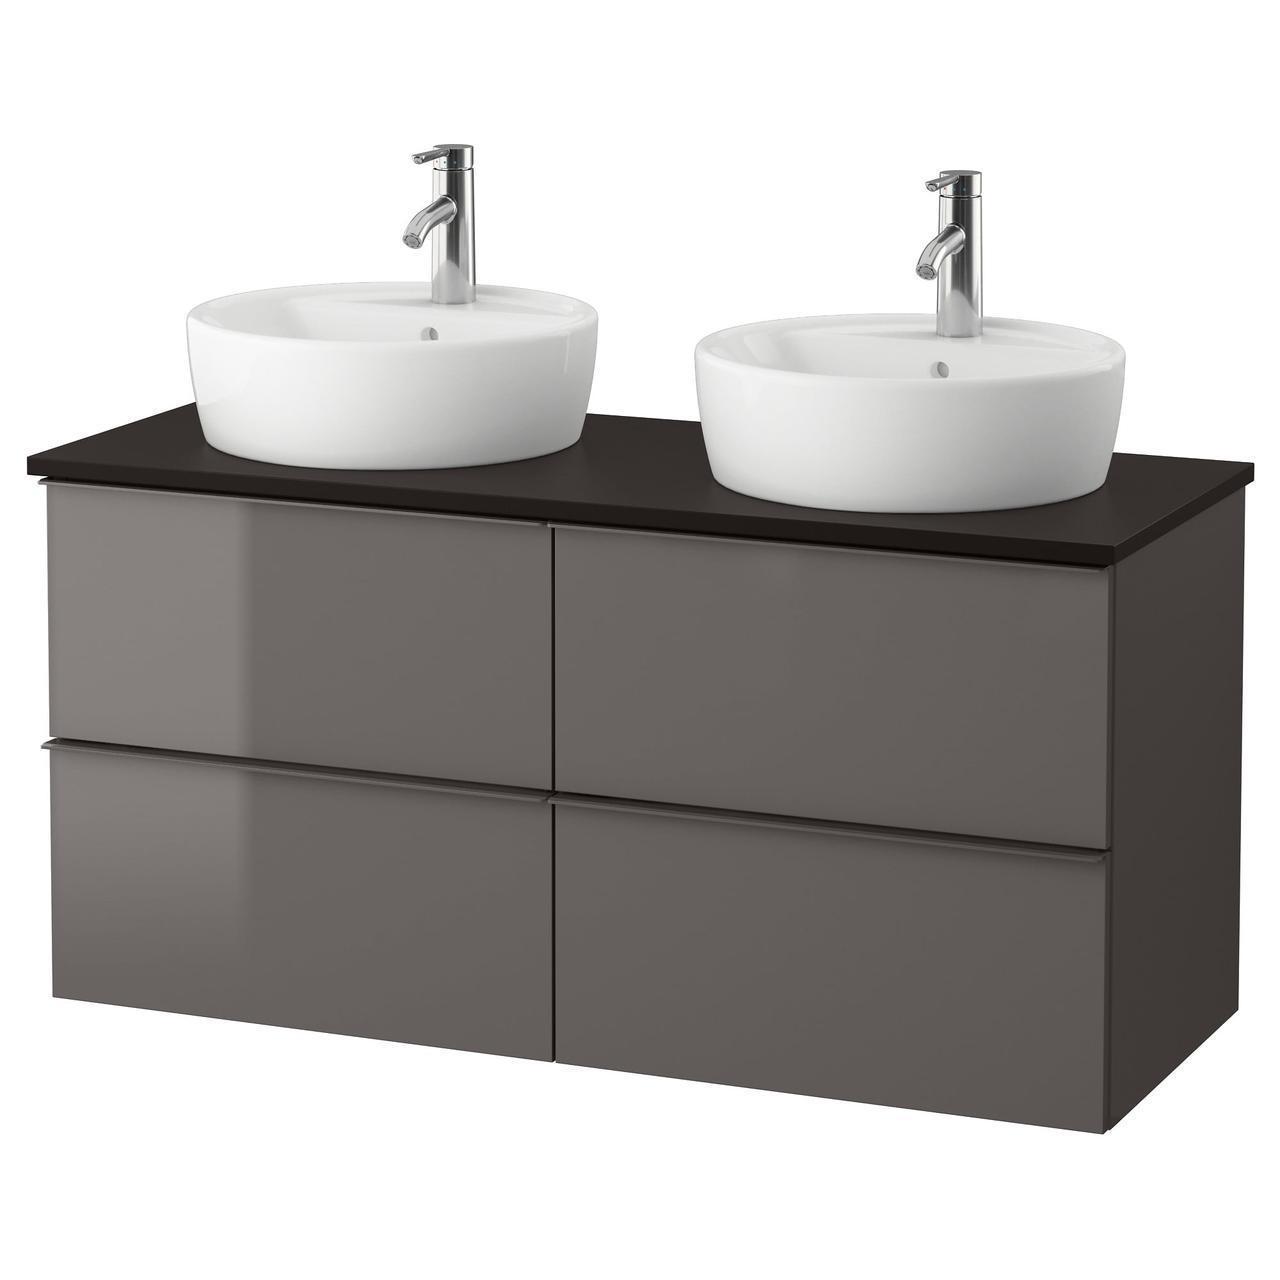 IKEA GODMORGON/TOLKEN/TORNVIKEN Шкаф под умывальник с раковиной, глянцевый серый, антрацит  (091.857.87)